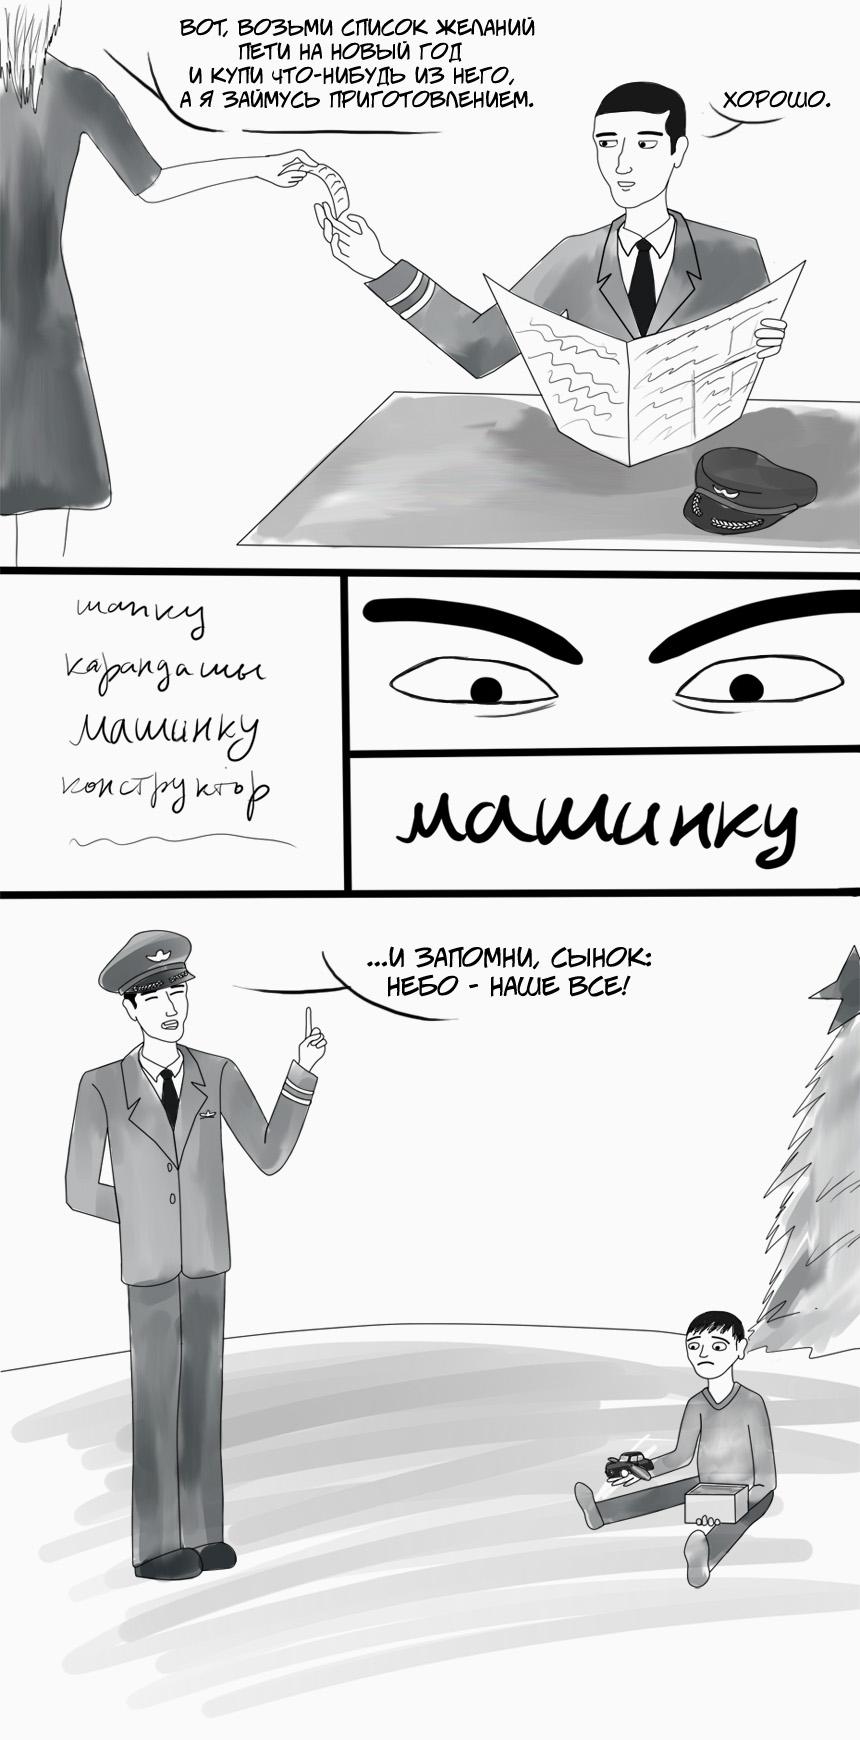 Комикс битва №16 выпуск 97